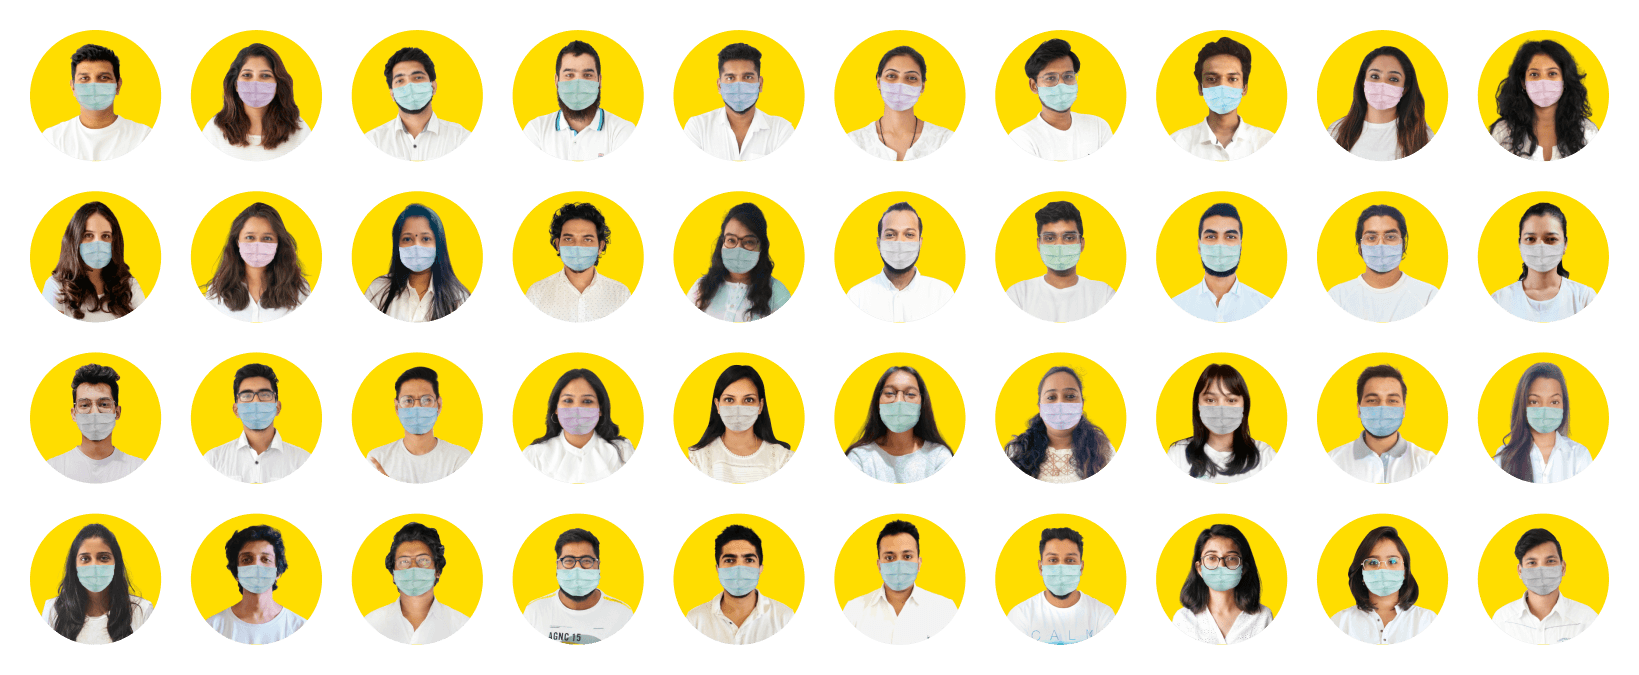 Netbramha Team with Mask